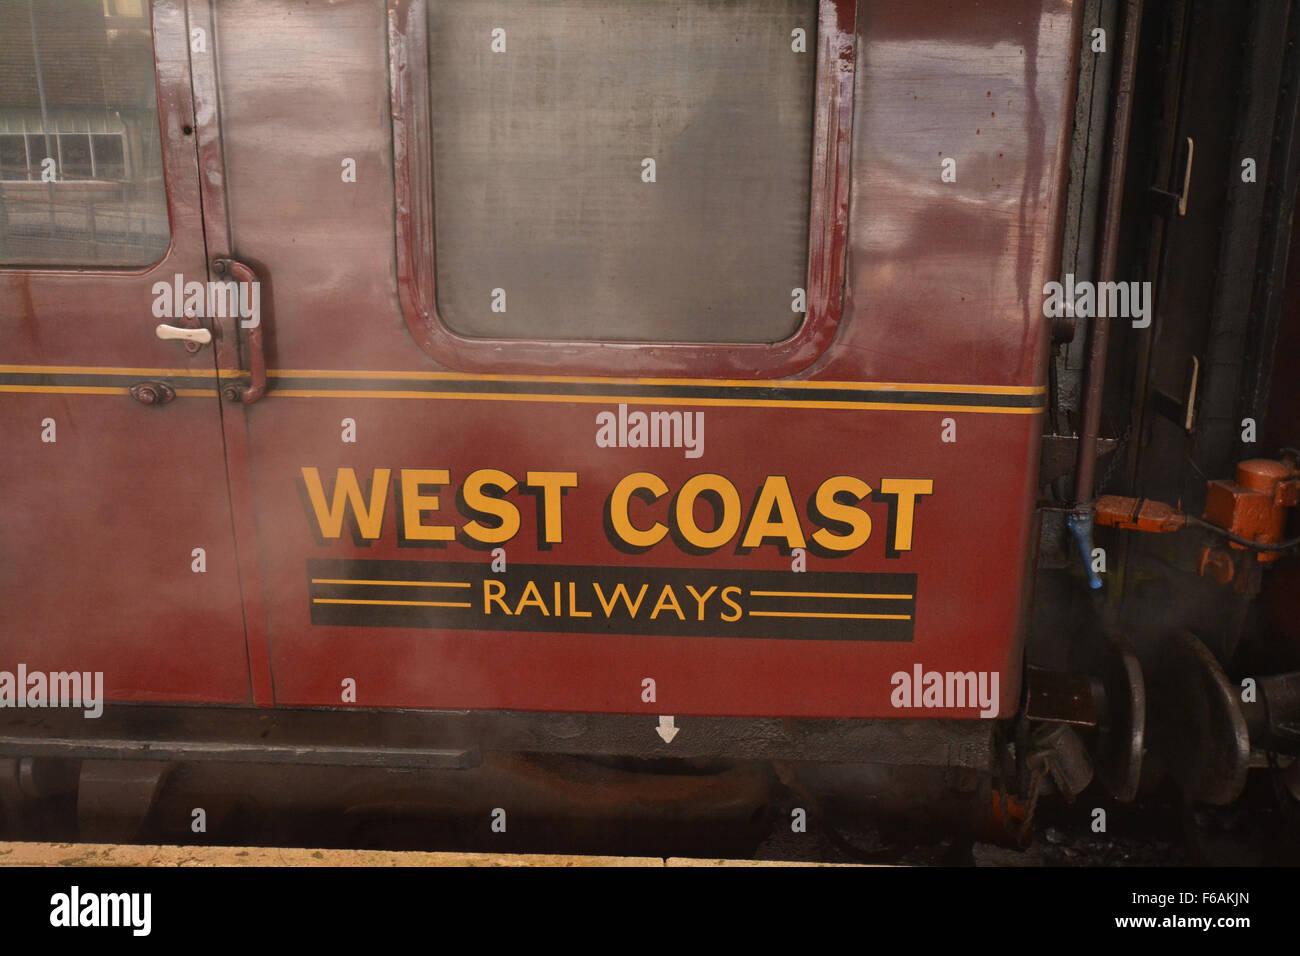 West Coast Railways Jacobite steam locomotive train at the platform in Fort William, Scotland, UK - Stock Image